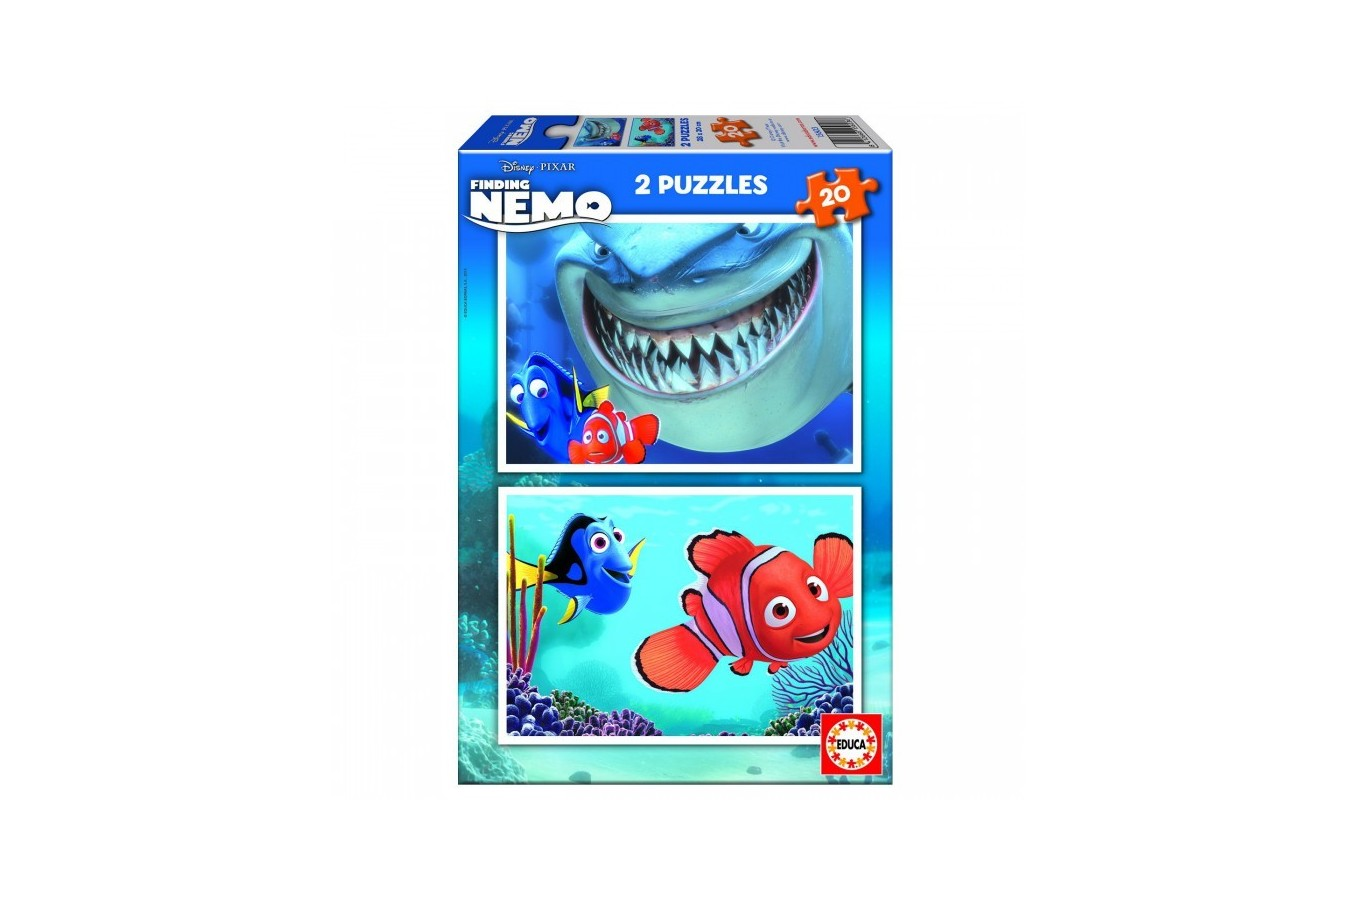 Puzzle Educa - Finding Nemo, 2x20 piese (15603)